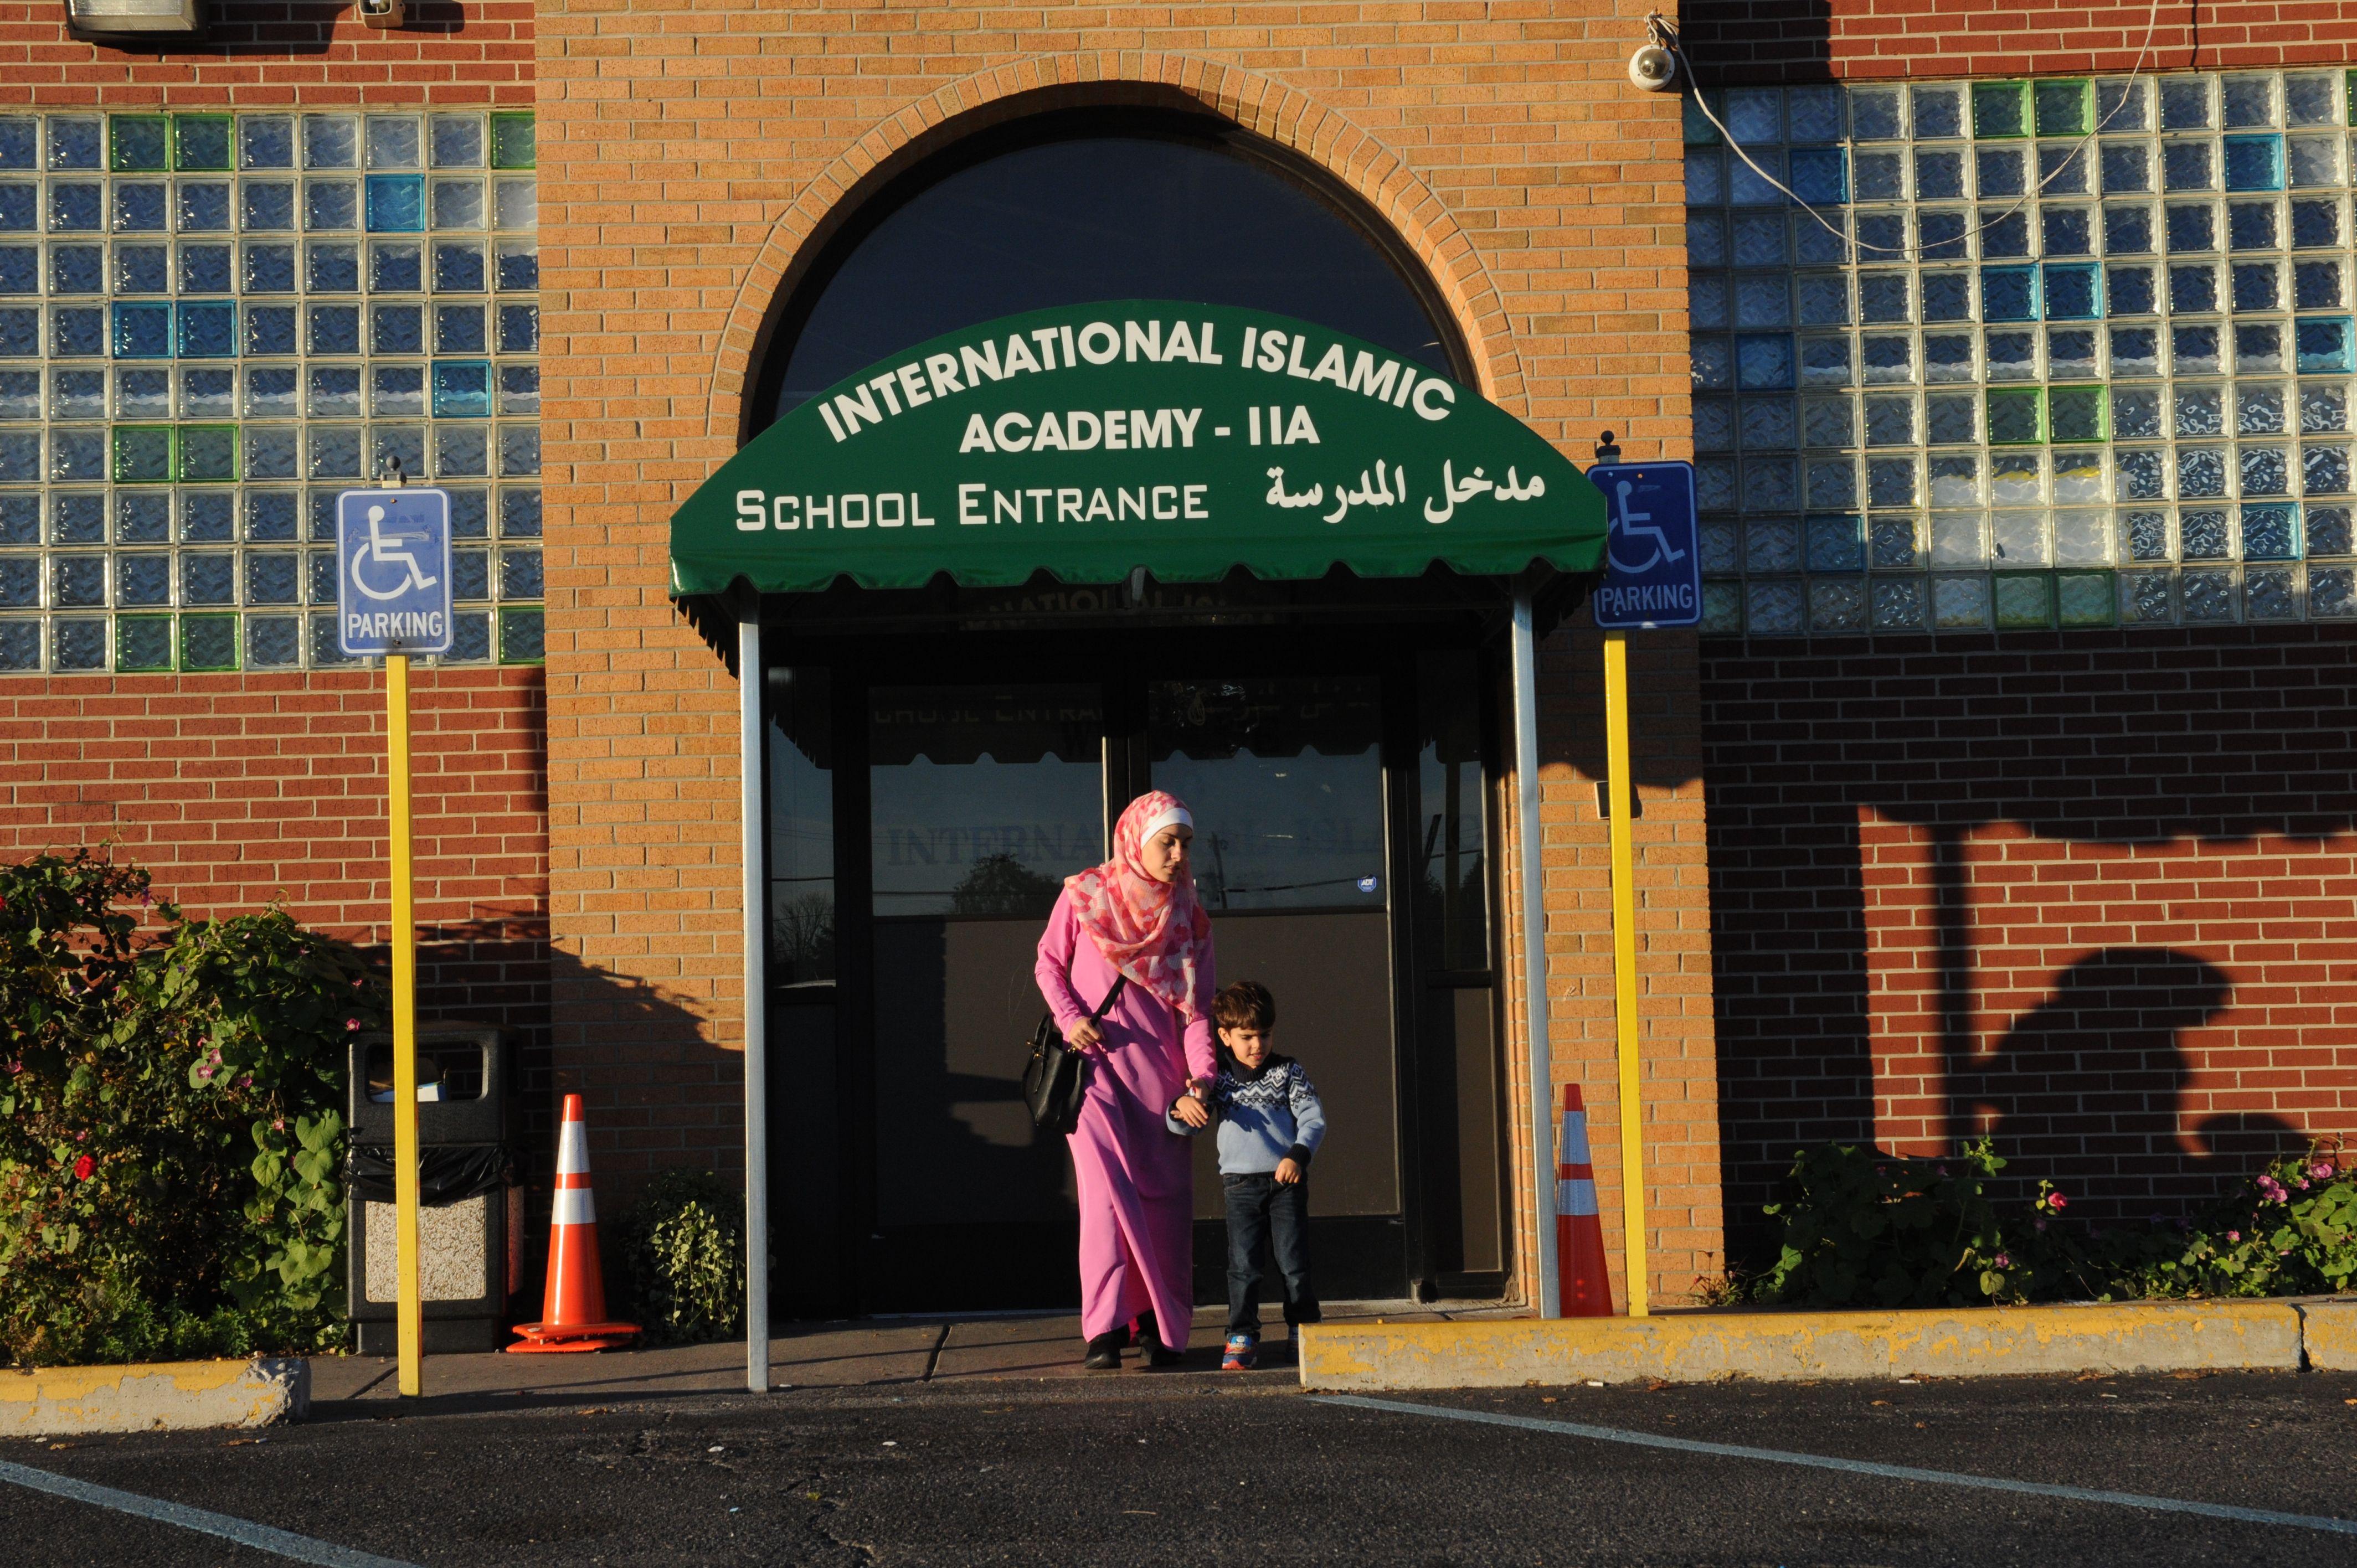 Amani Ramouni, 27, leaves the International Islamic Academy with her son Shadi, 3, in Detroit on November 9, 2016.